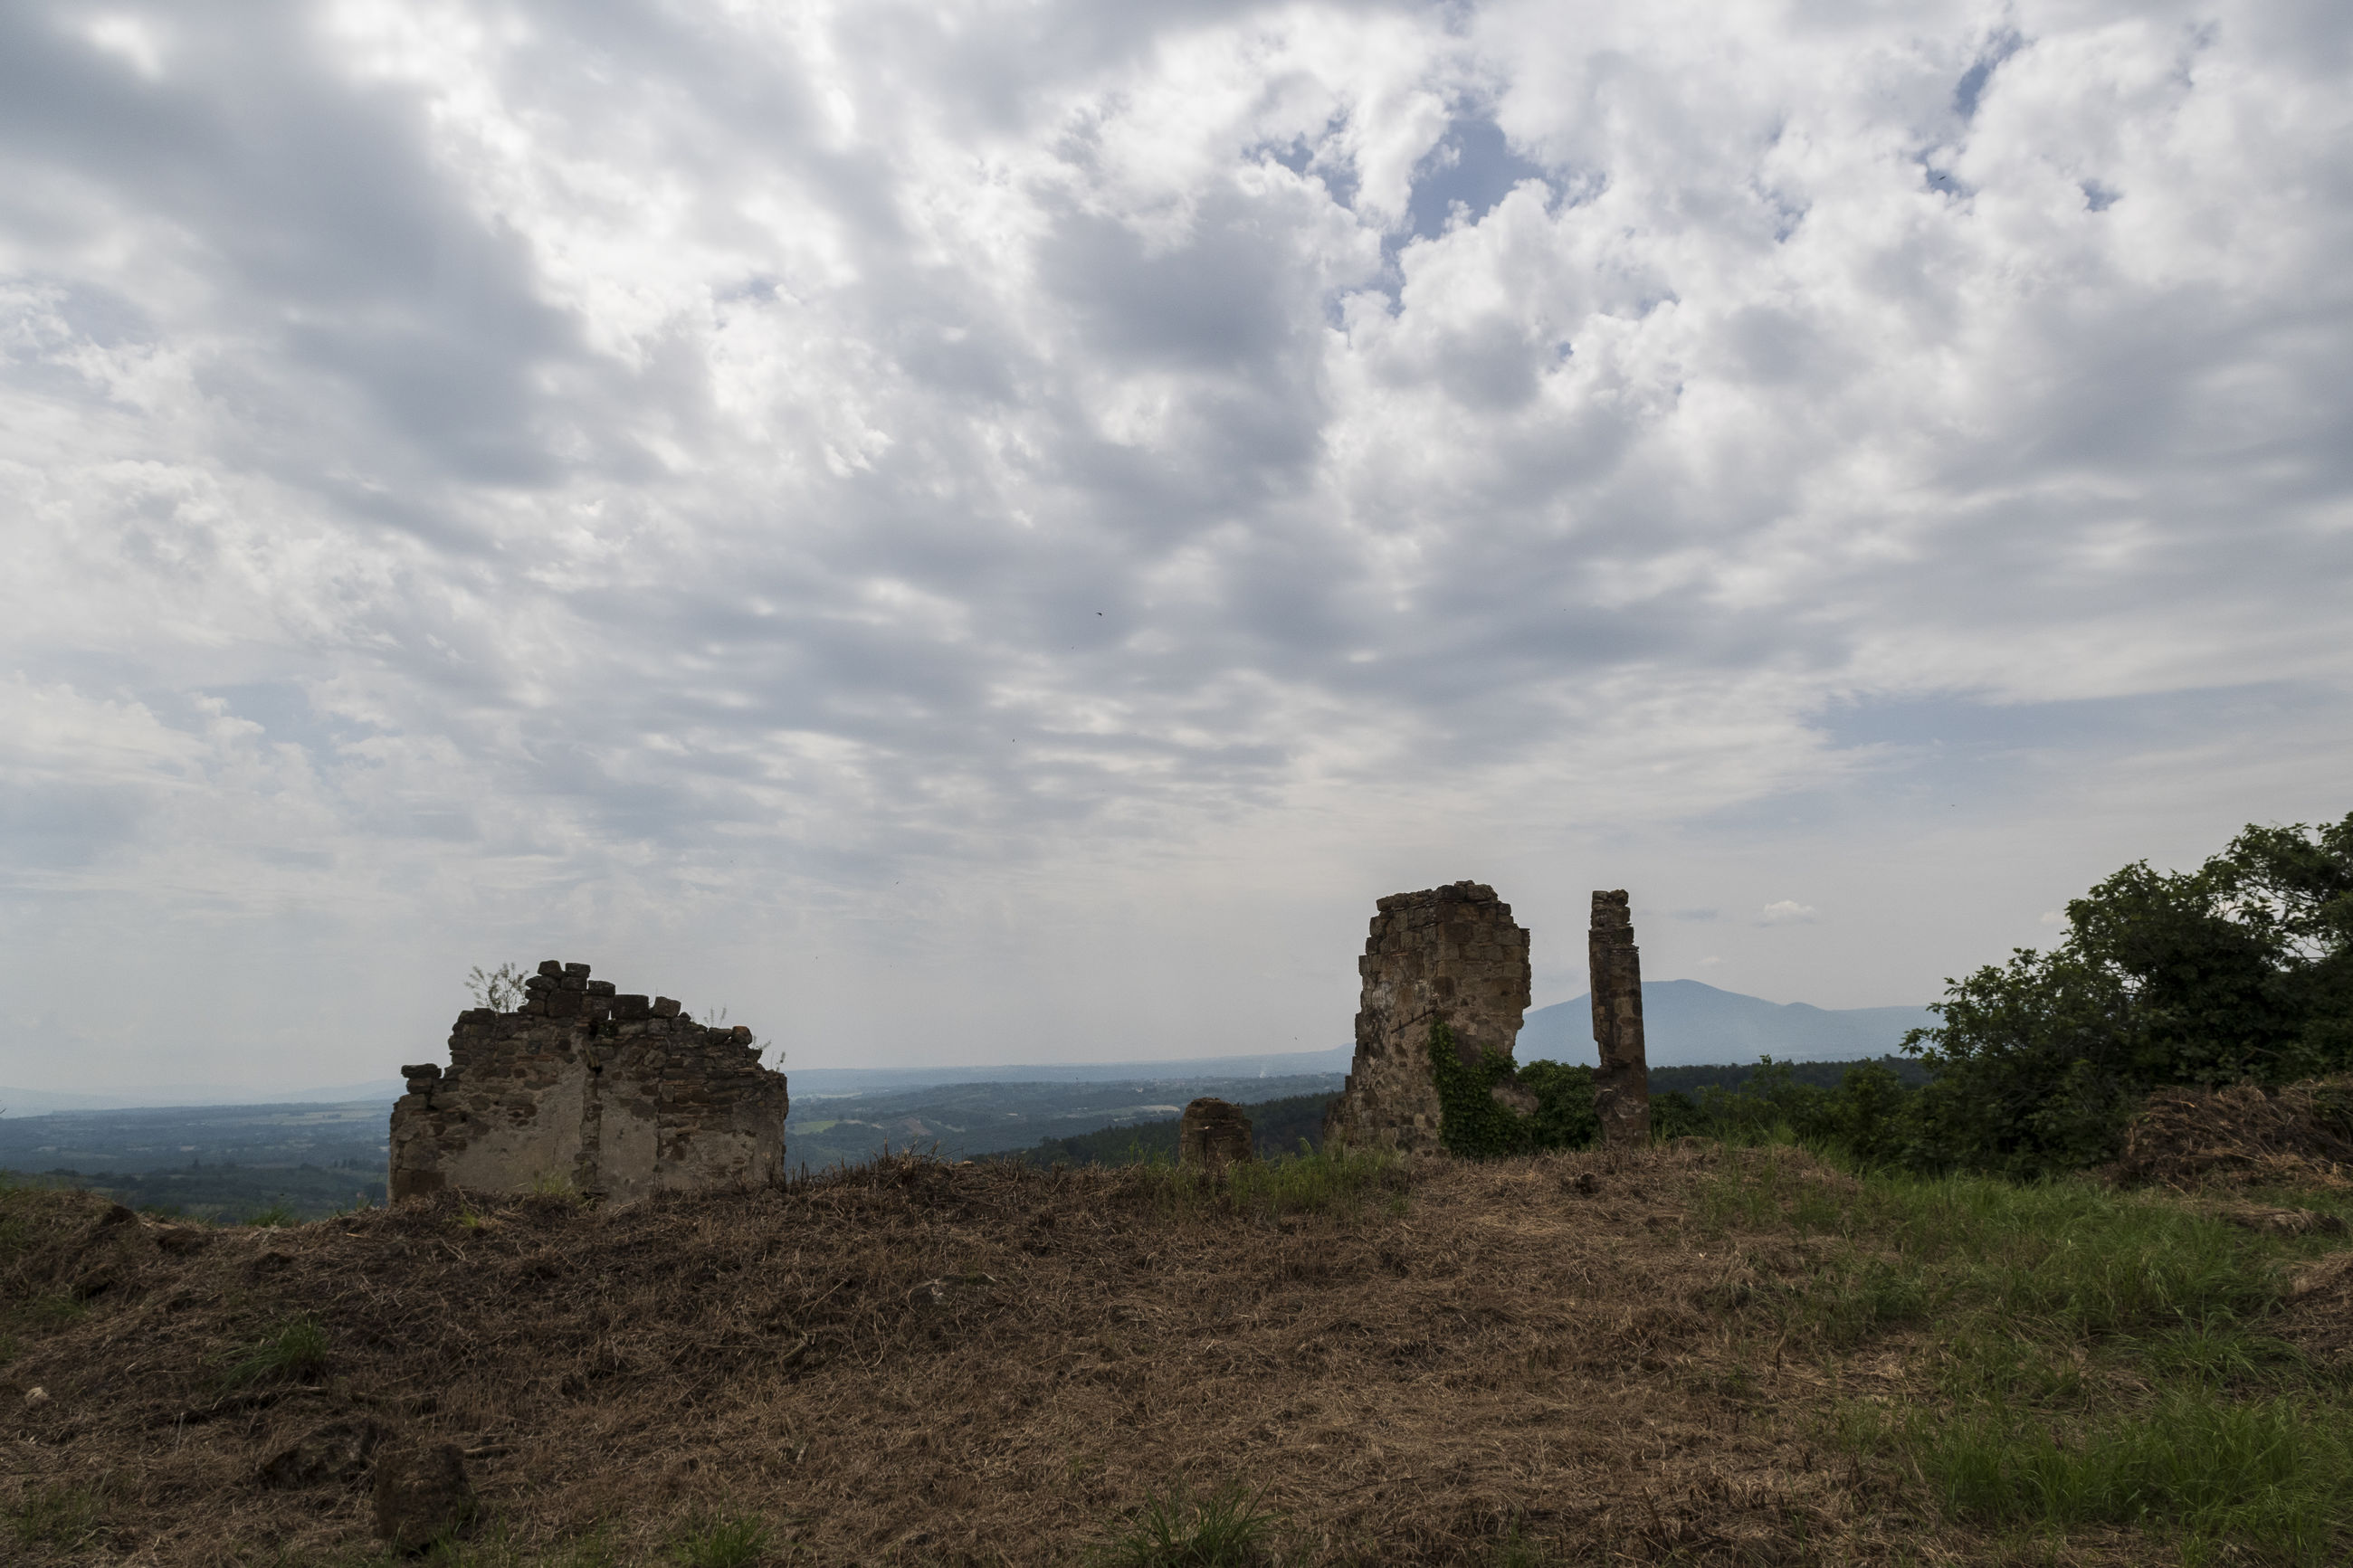 Old ruin building on landscape against sky